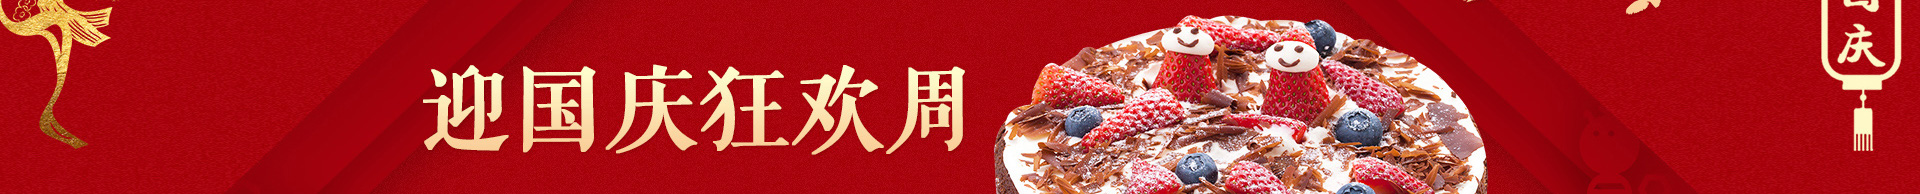 ebeecake小蜜蜂蛋糕 迎国庆狂欢周